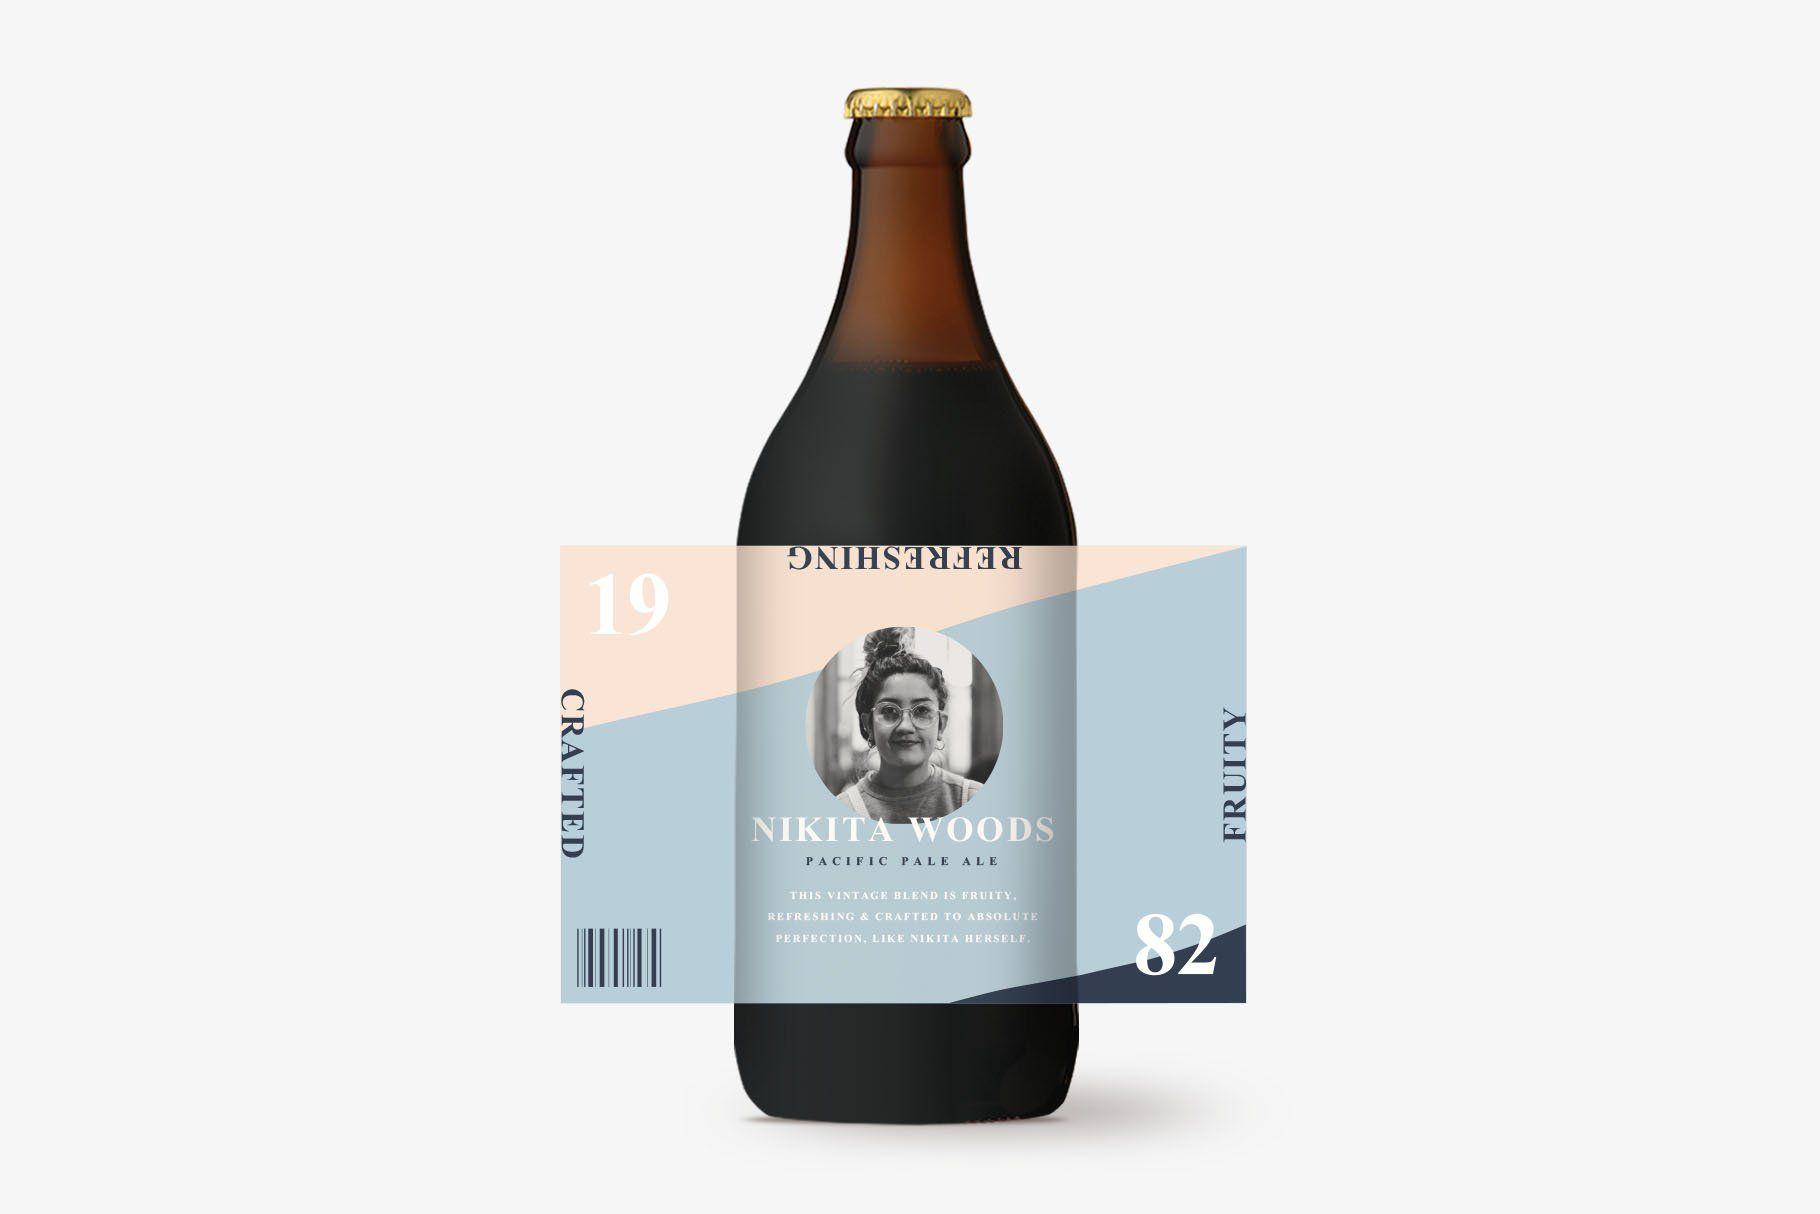 006 Shocking Microsoft Word Beer Label Template High Definition  BottleFull